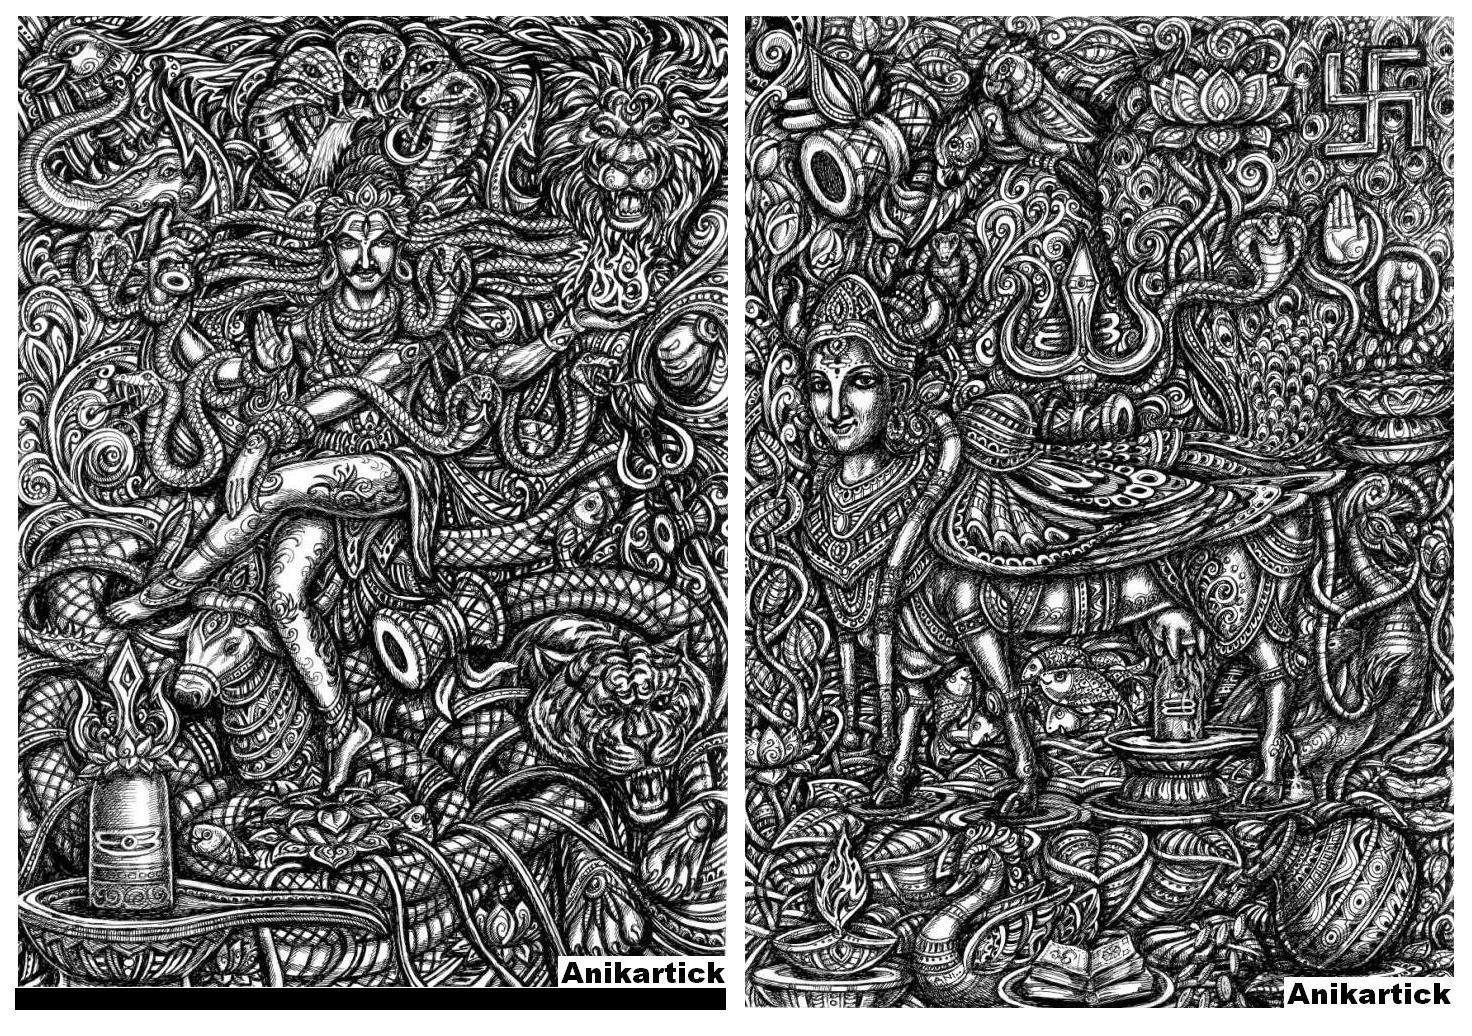 Vinayagar sketches god art god illustrations indian gods god images god photos god pen drawings god paintings artist anikartickchennai